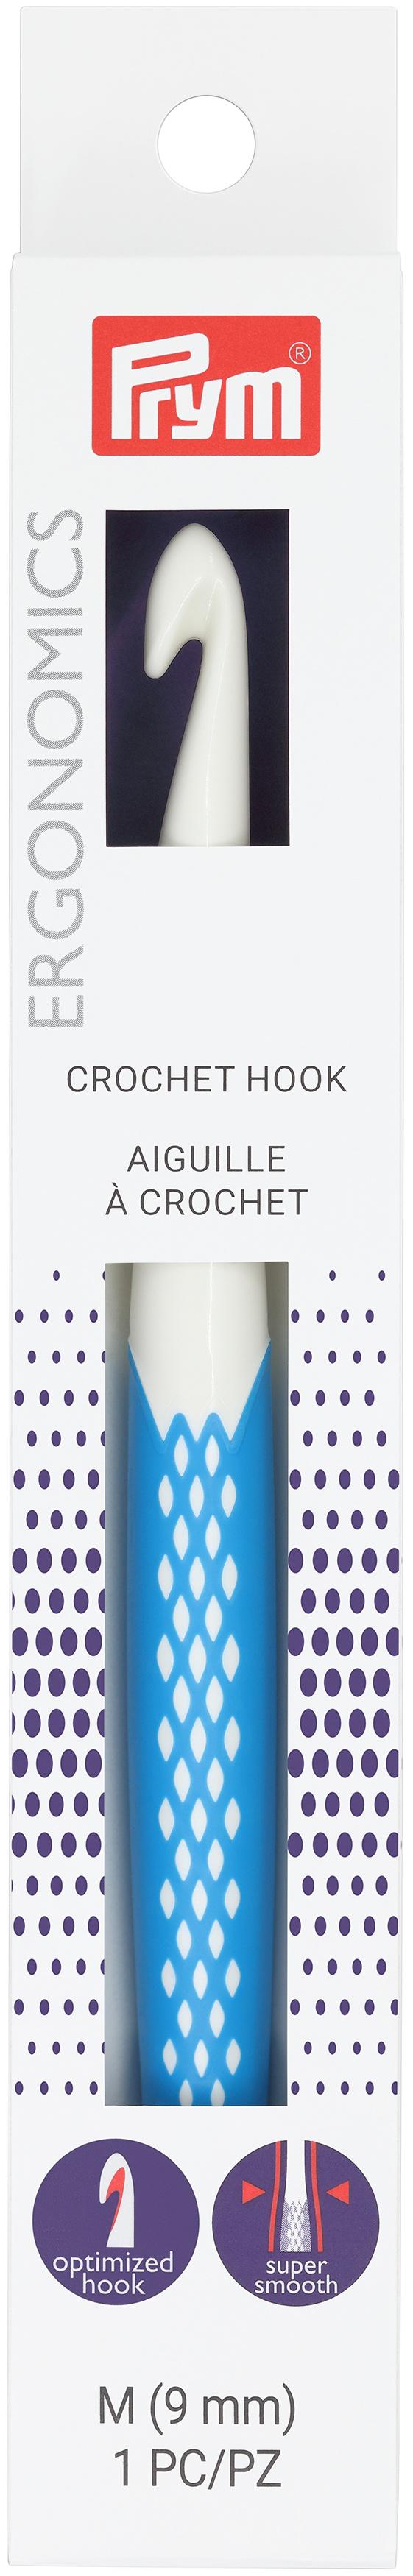 Prym Crochet Hook-Size M13/9mm